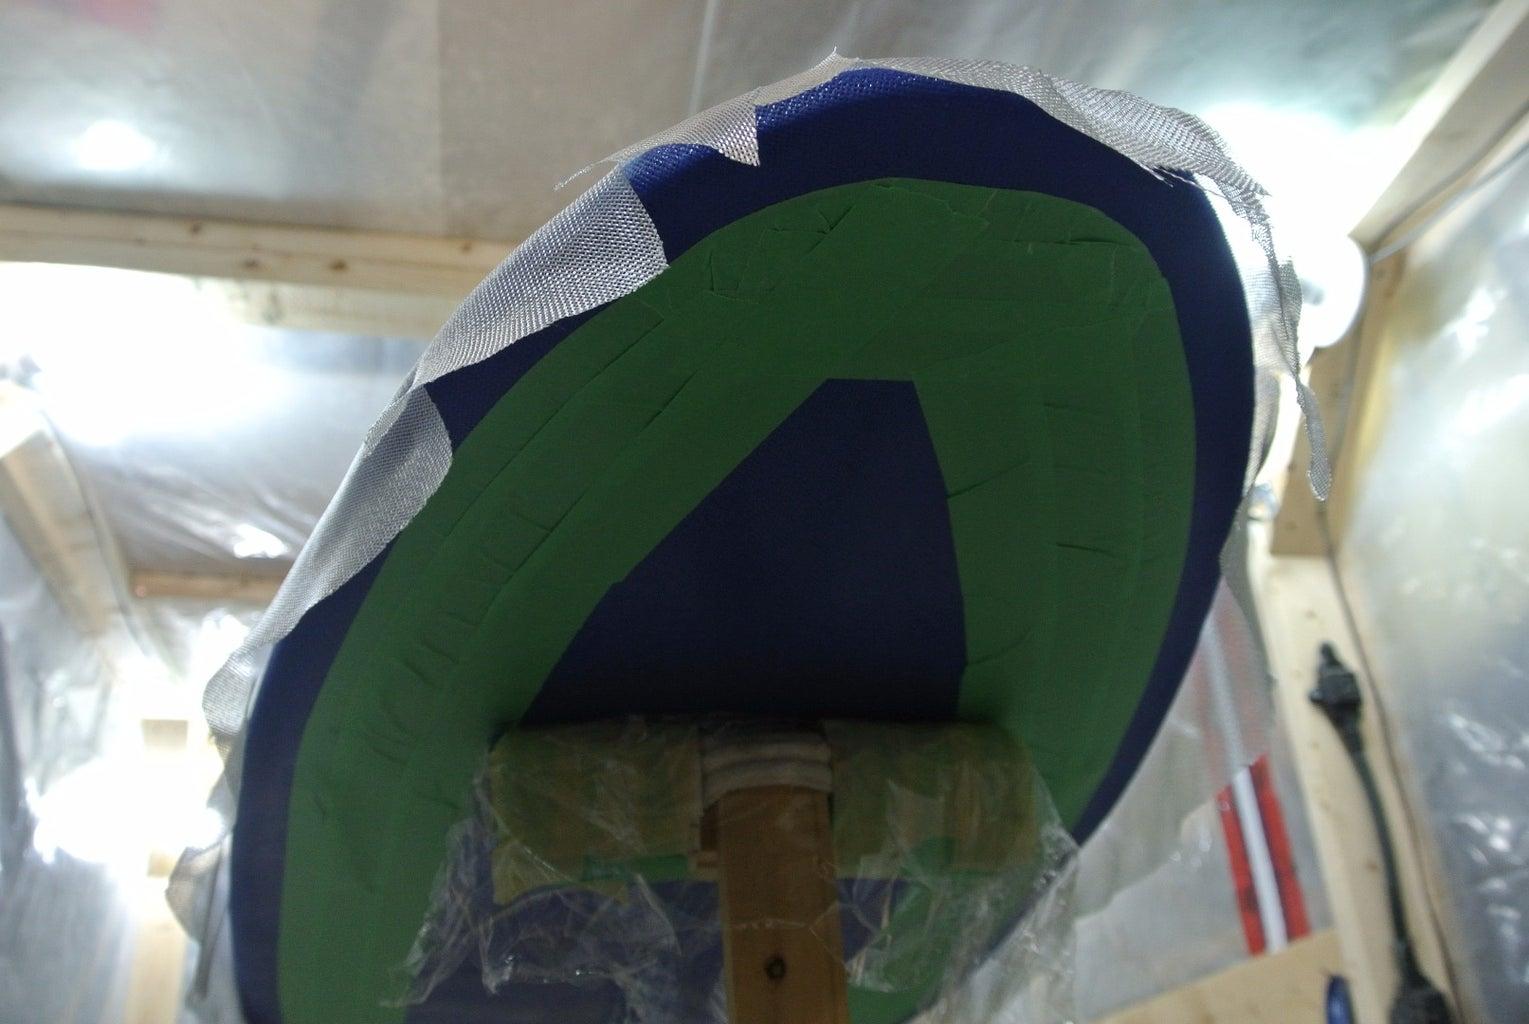 Deck Cut-Lap and Cutting Fiberglass for the Deck